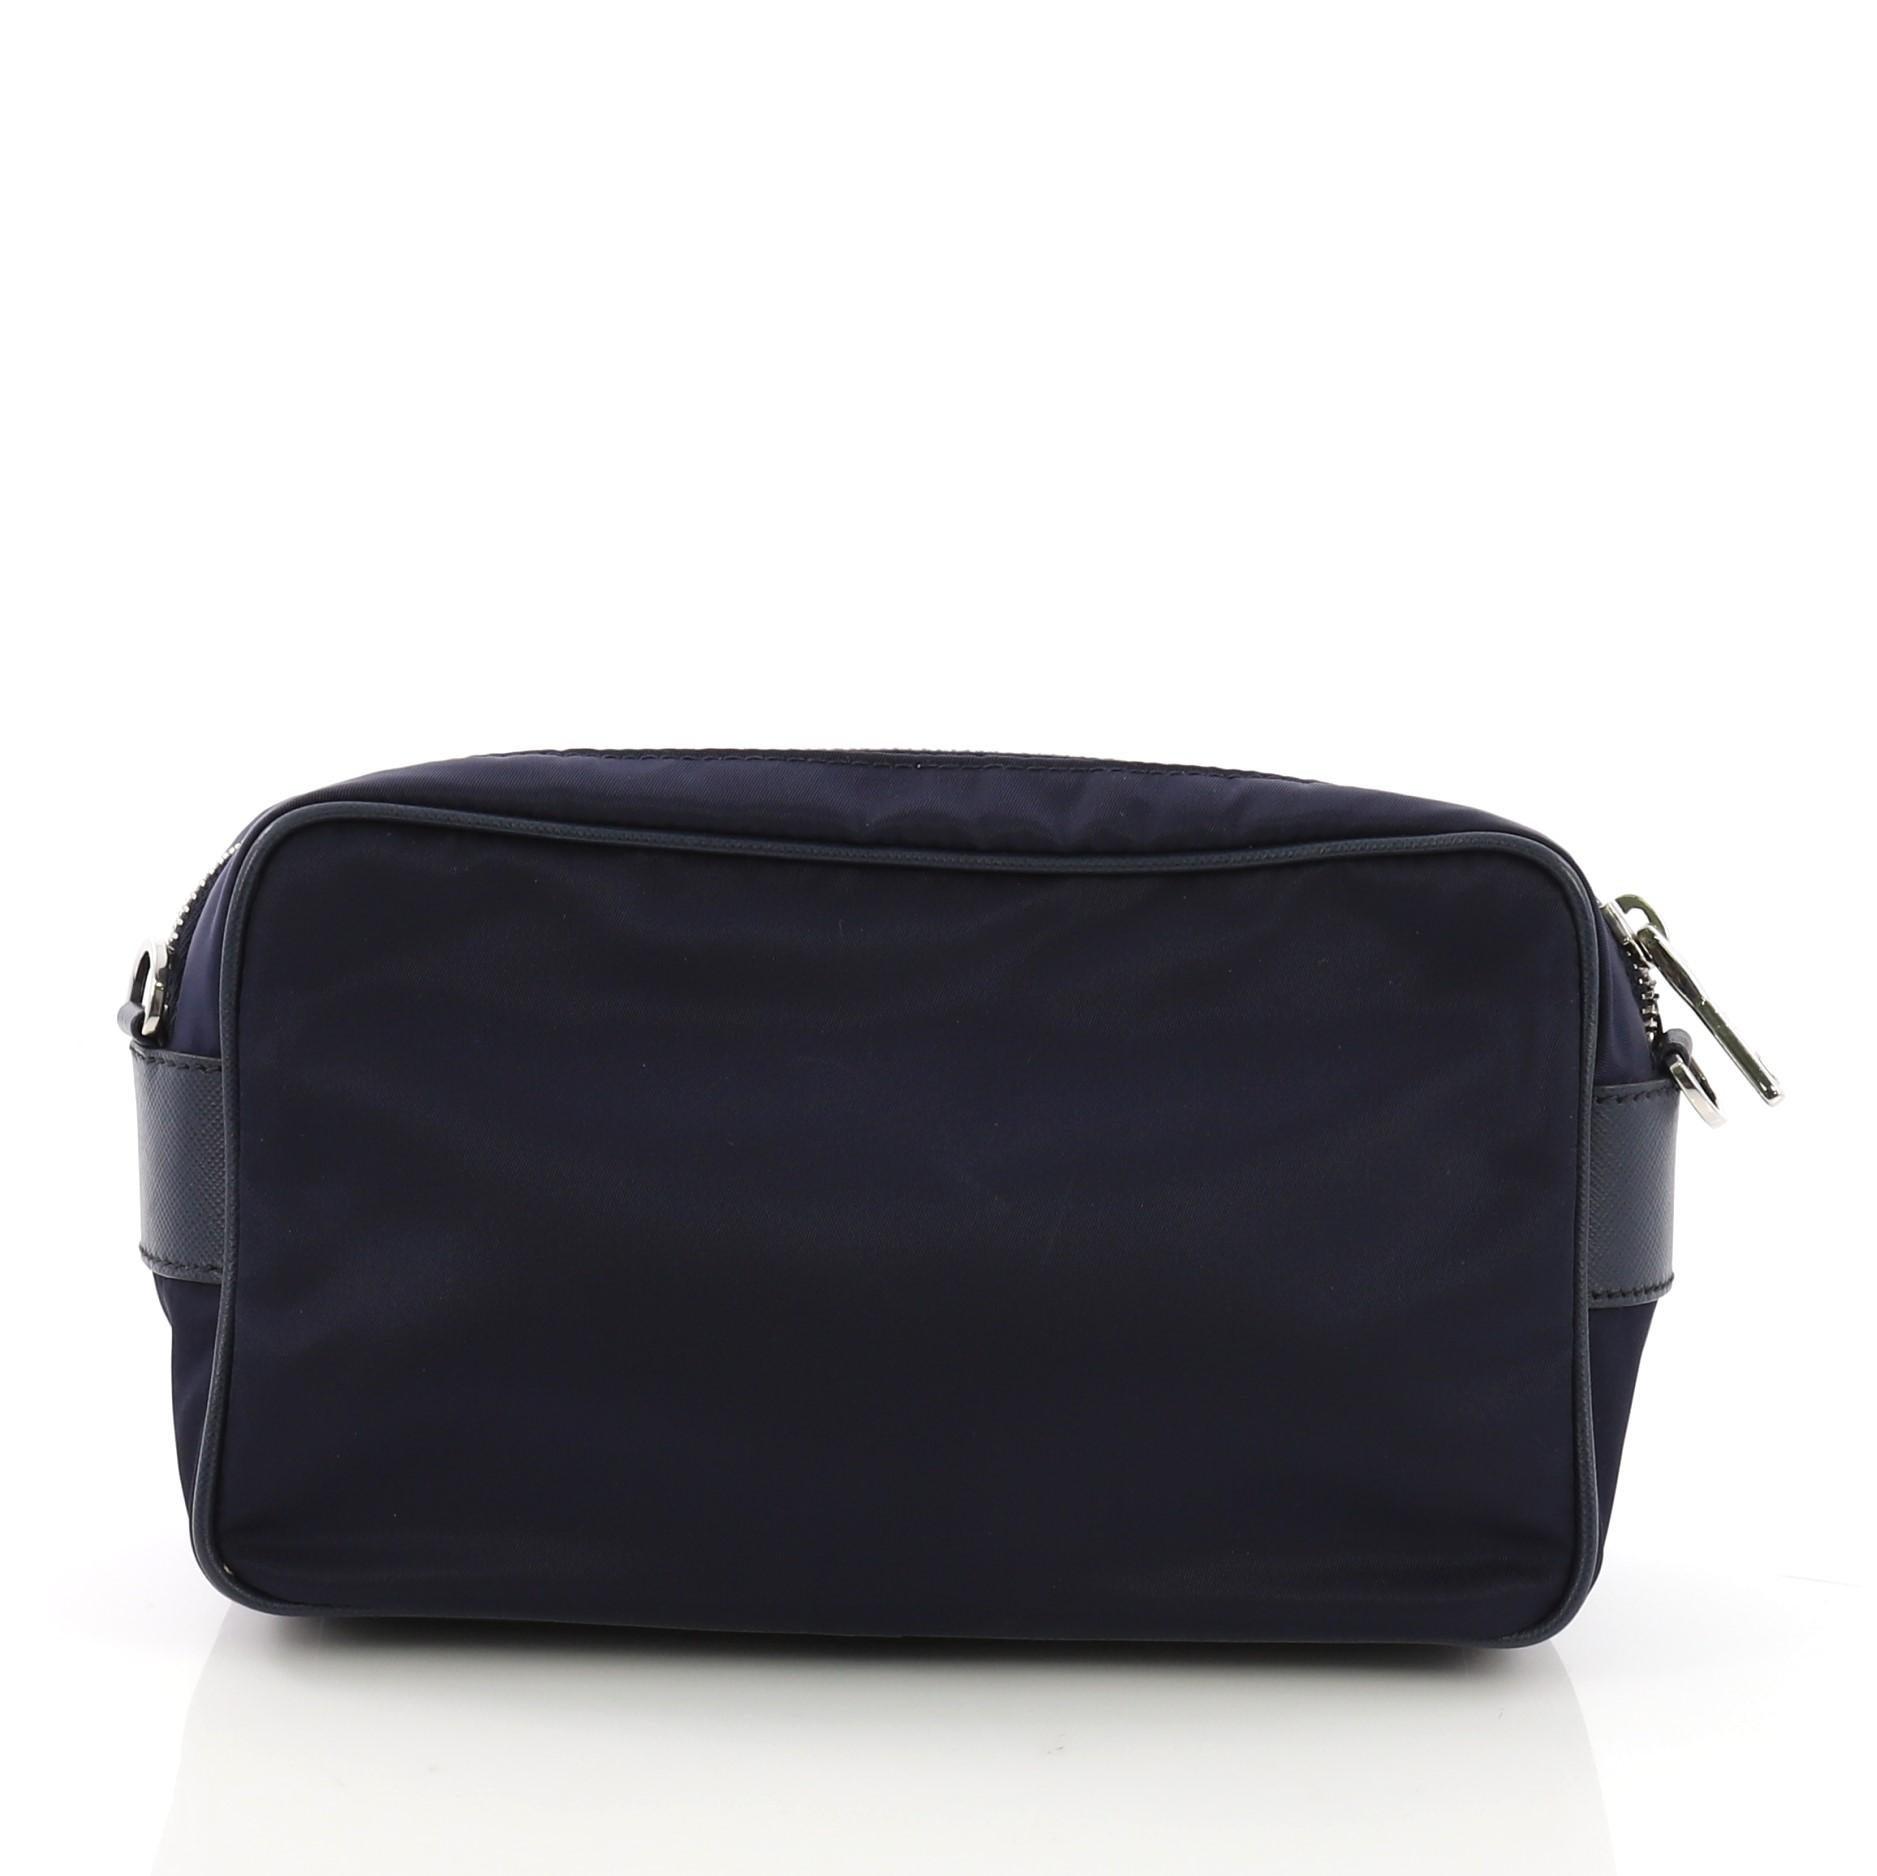 7546b5dffda1 Prada Front Pocket Crossbody Bag Tessuto Small at 1stdibs